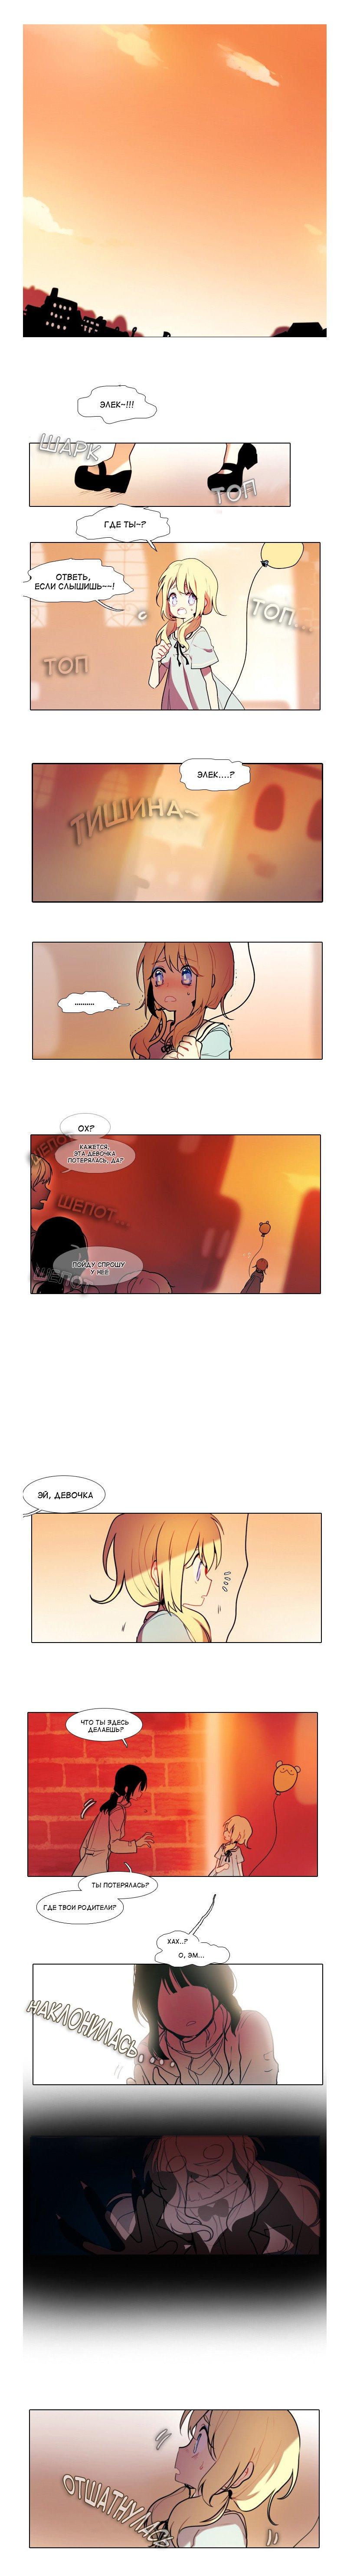 Манга Конец и Спасение - Глава 21 Страница 1